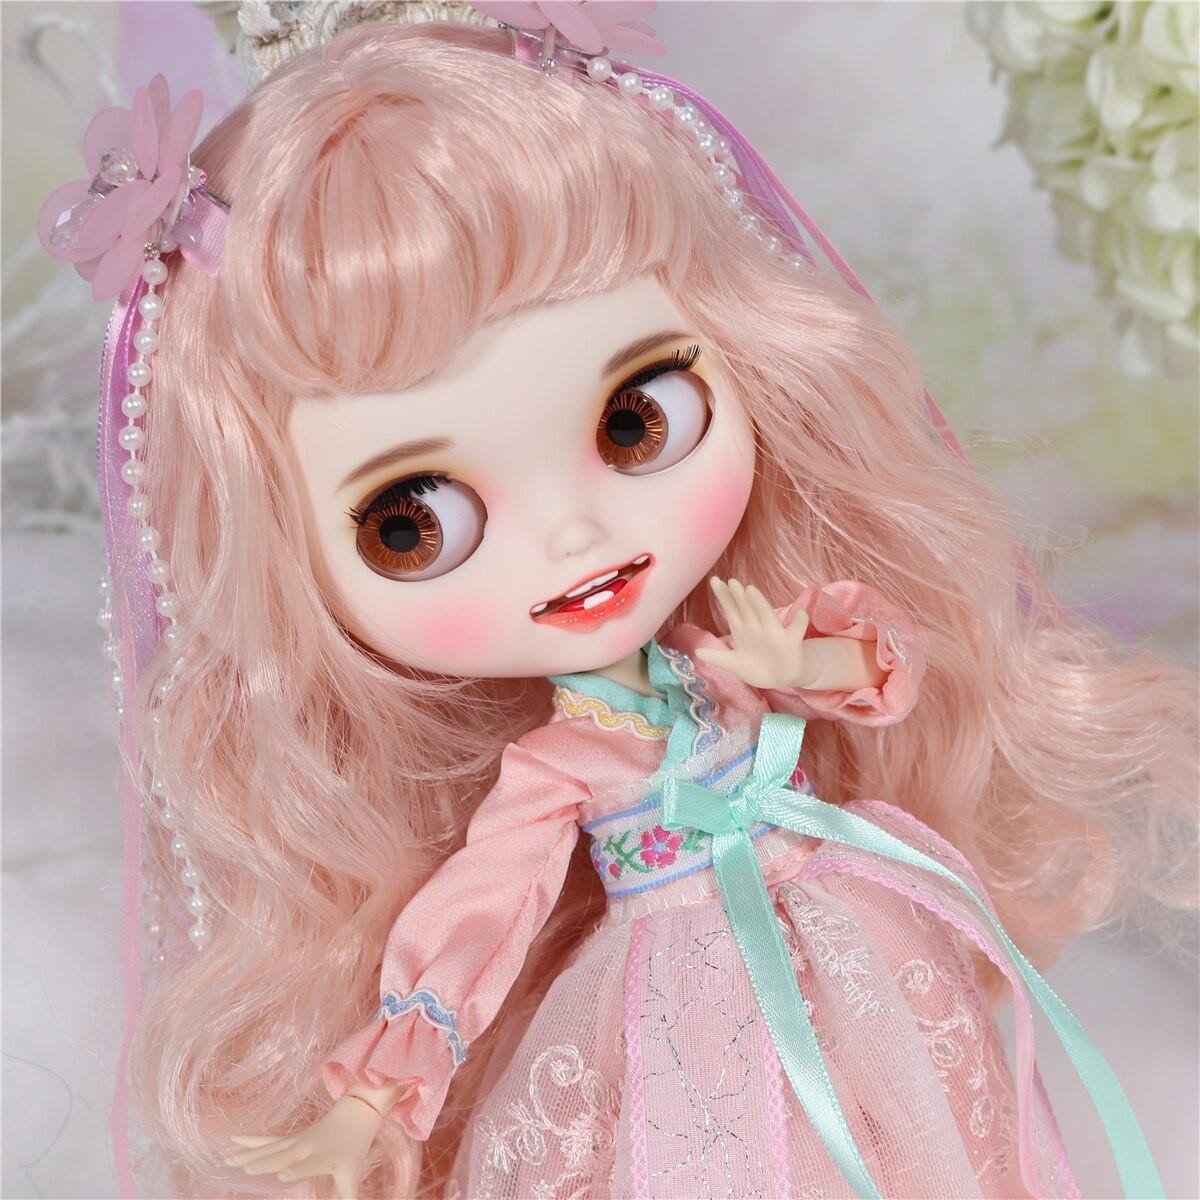 Lilliana – Premium Custom Blythe Doll with Clothes Smiling Face Premium Blythe Dolls 🆕 Smiling Face